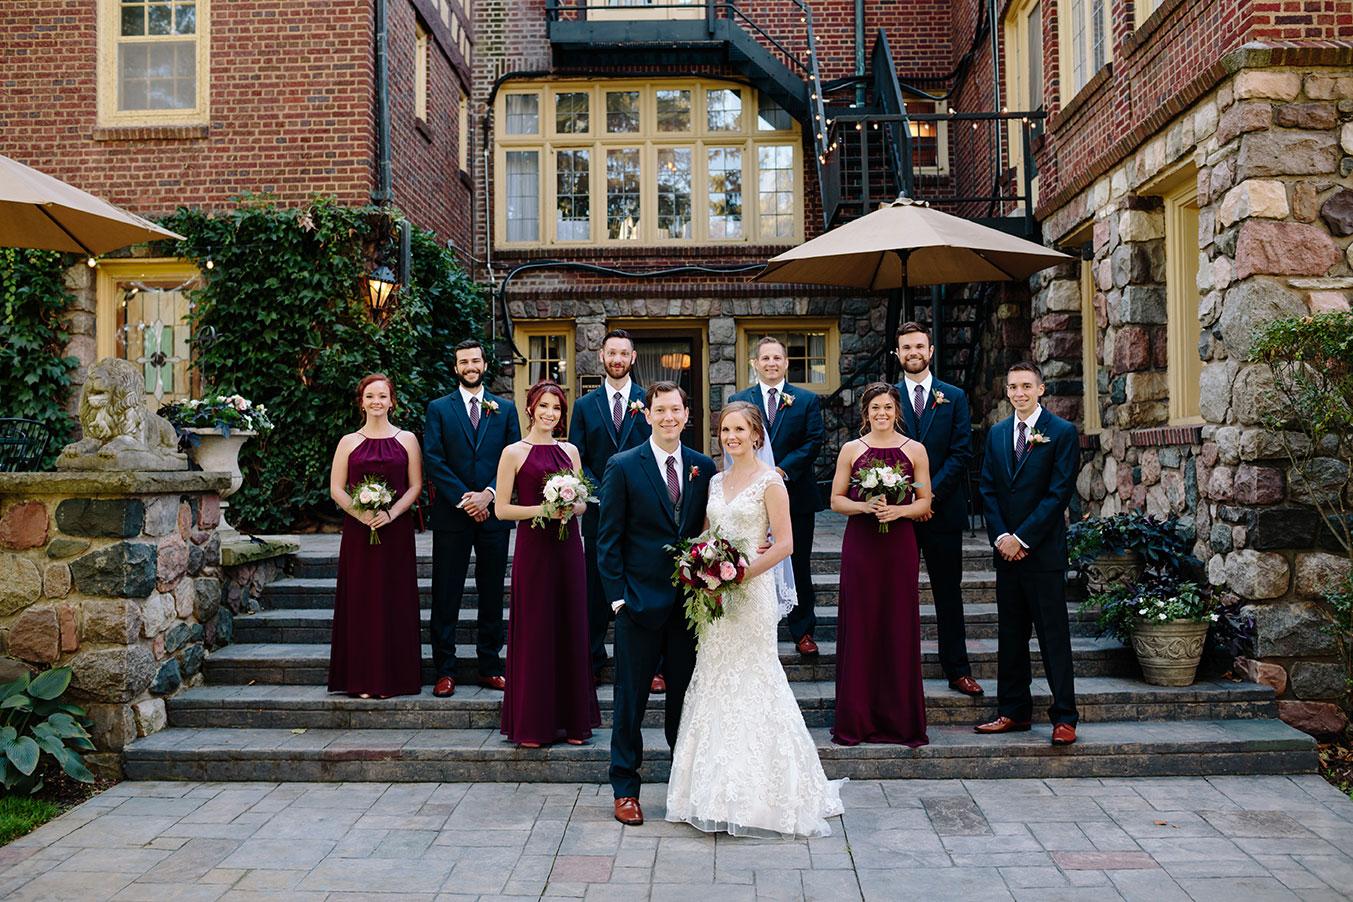 English_Inn_Wedding_061.jpg